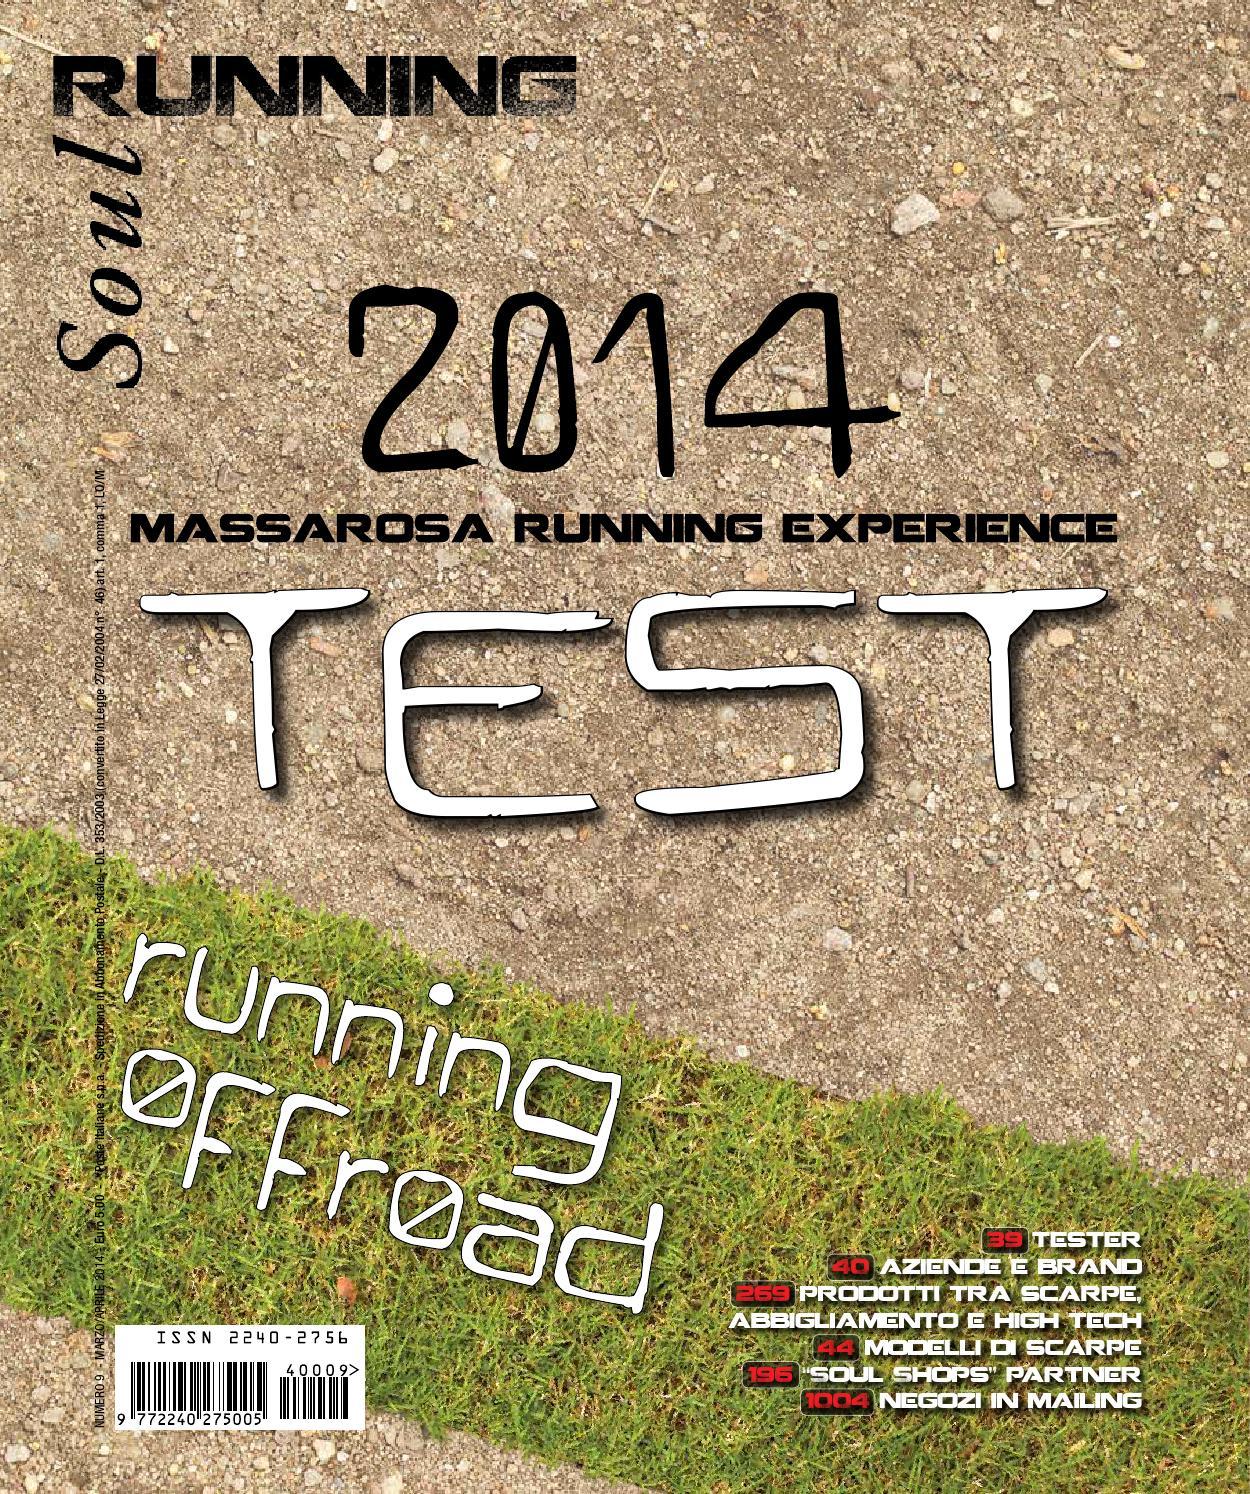 Guida Test Trail 2014 by SoulRunning - issuu 9e580d024b9